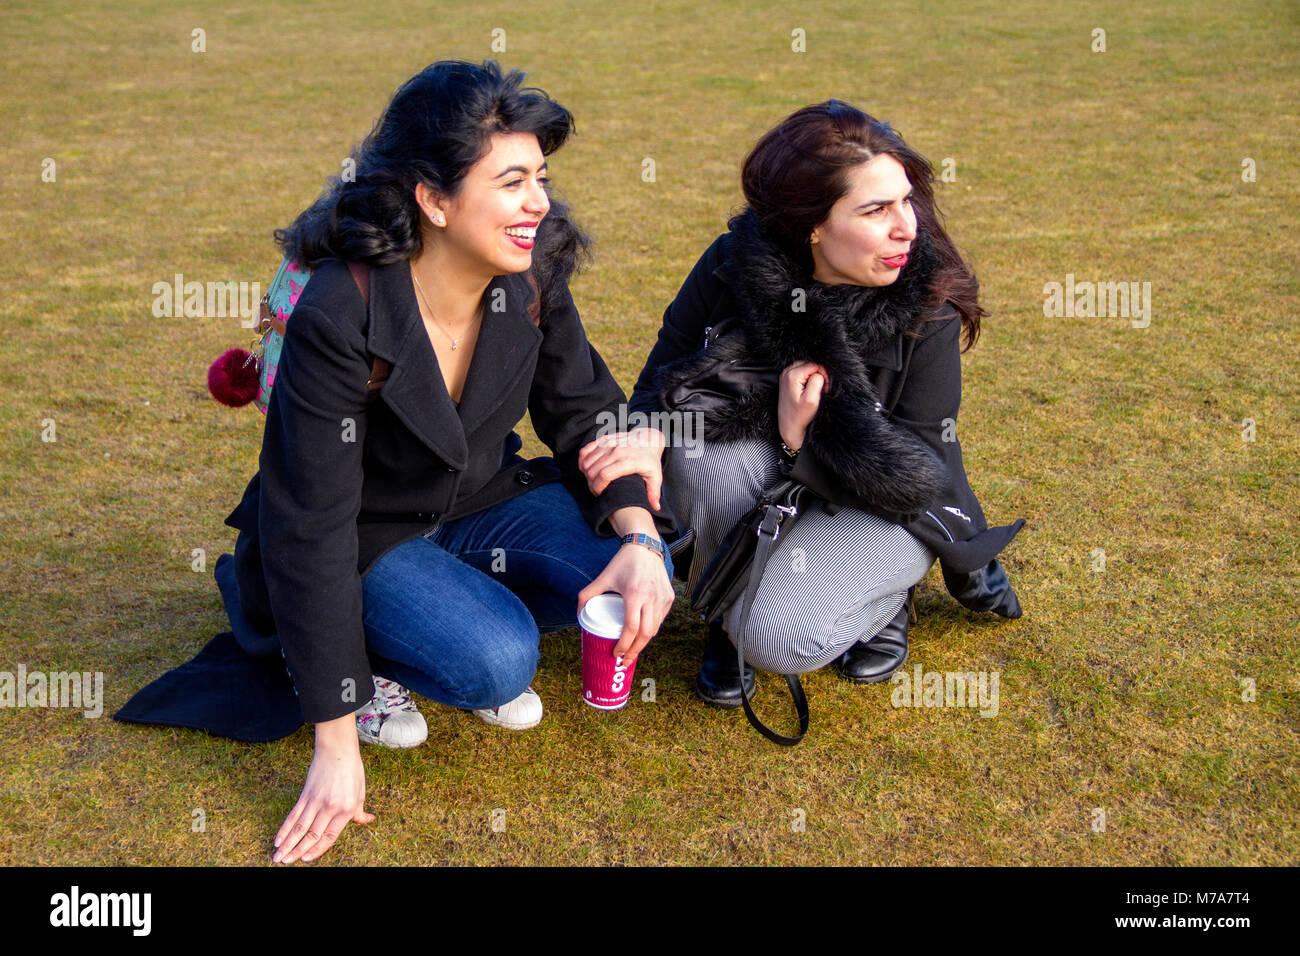 Two female students, Parisian-Algerian Faiza Faa (left) and her friend Samar Munaf from Iraq (right) having fun Stock Photo